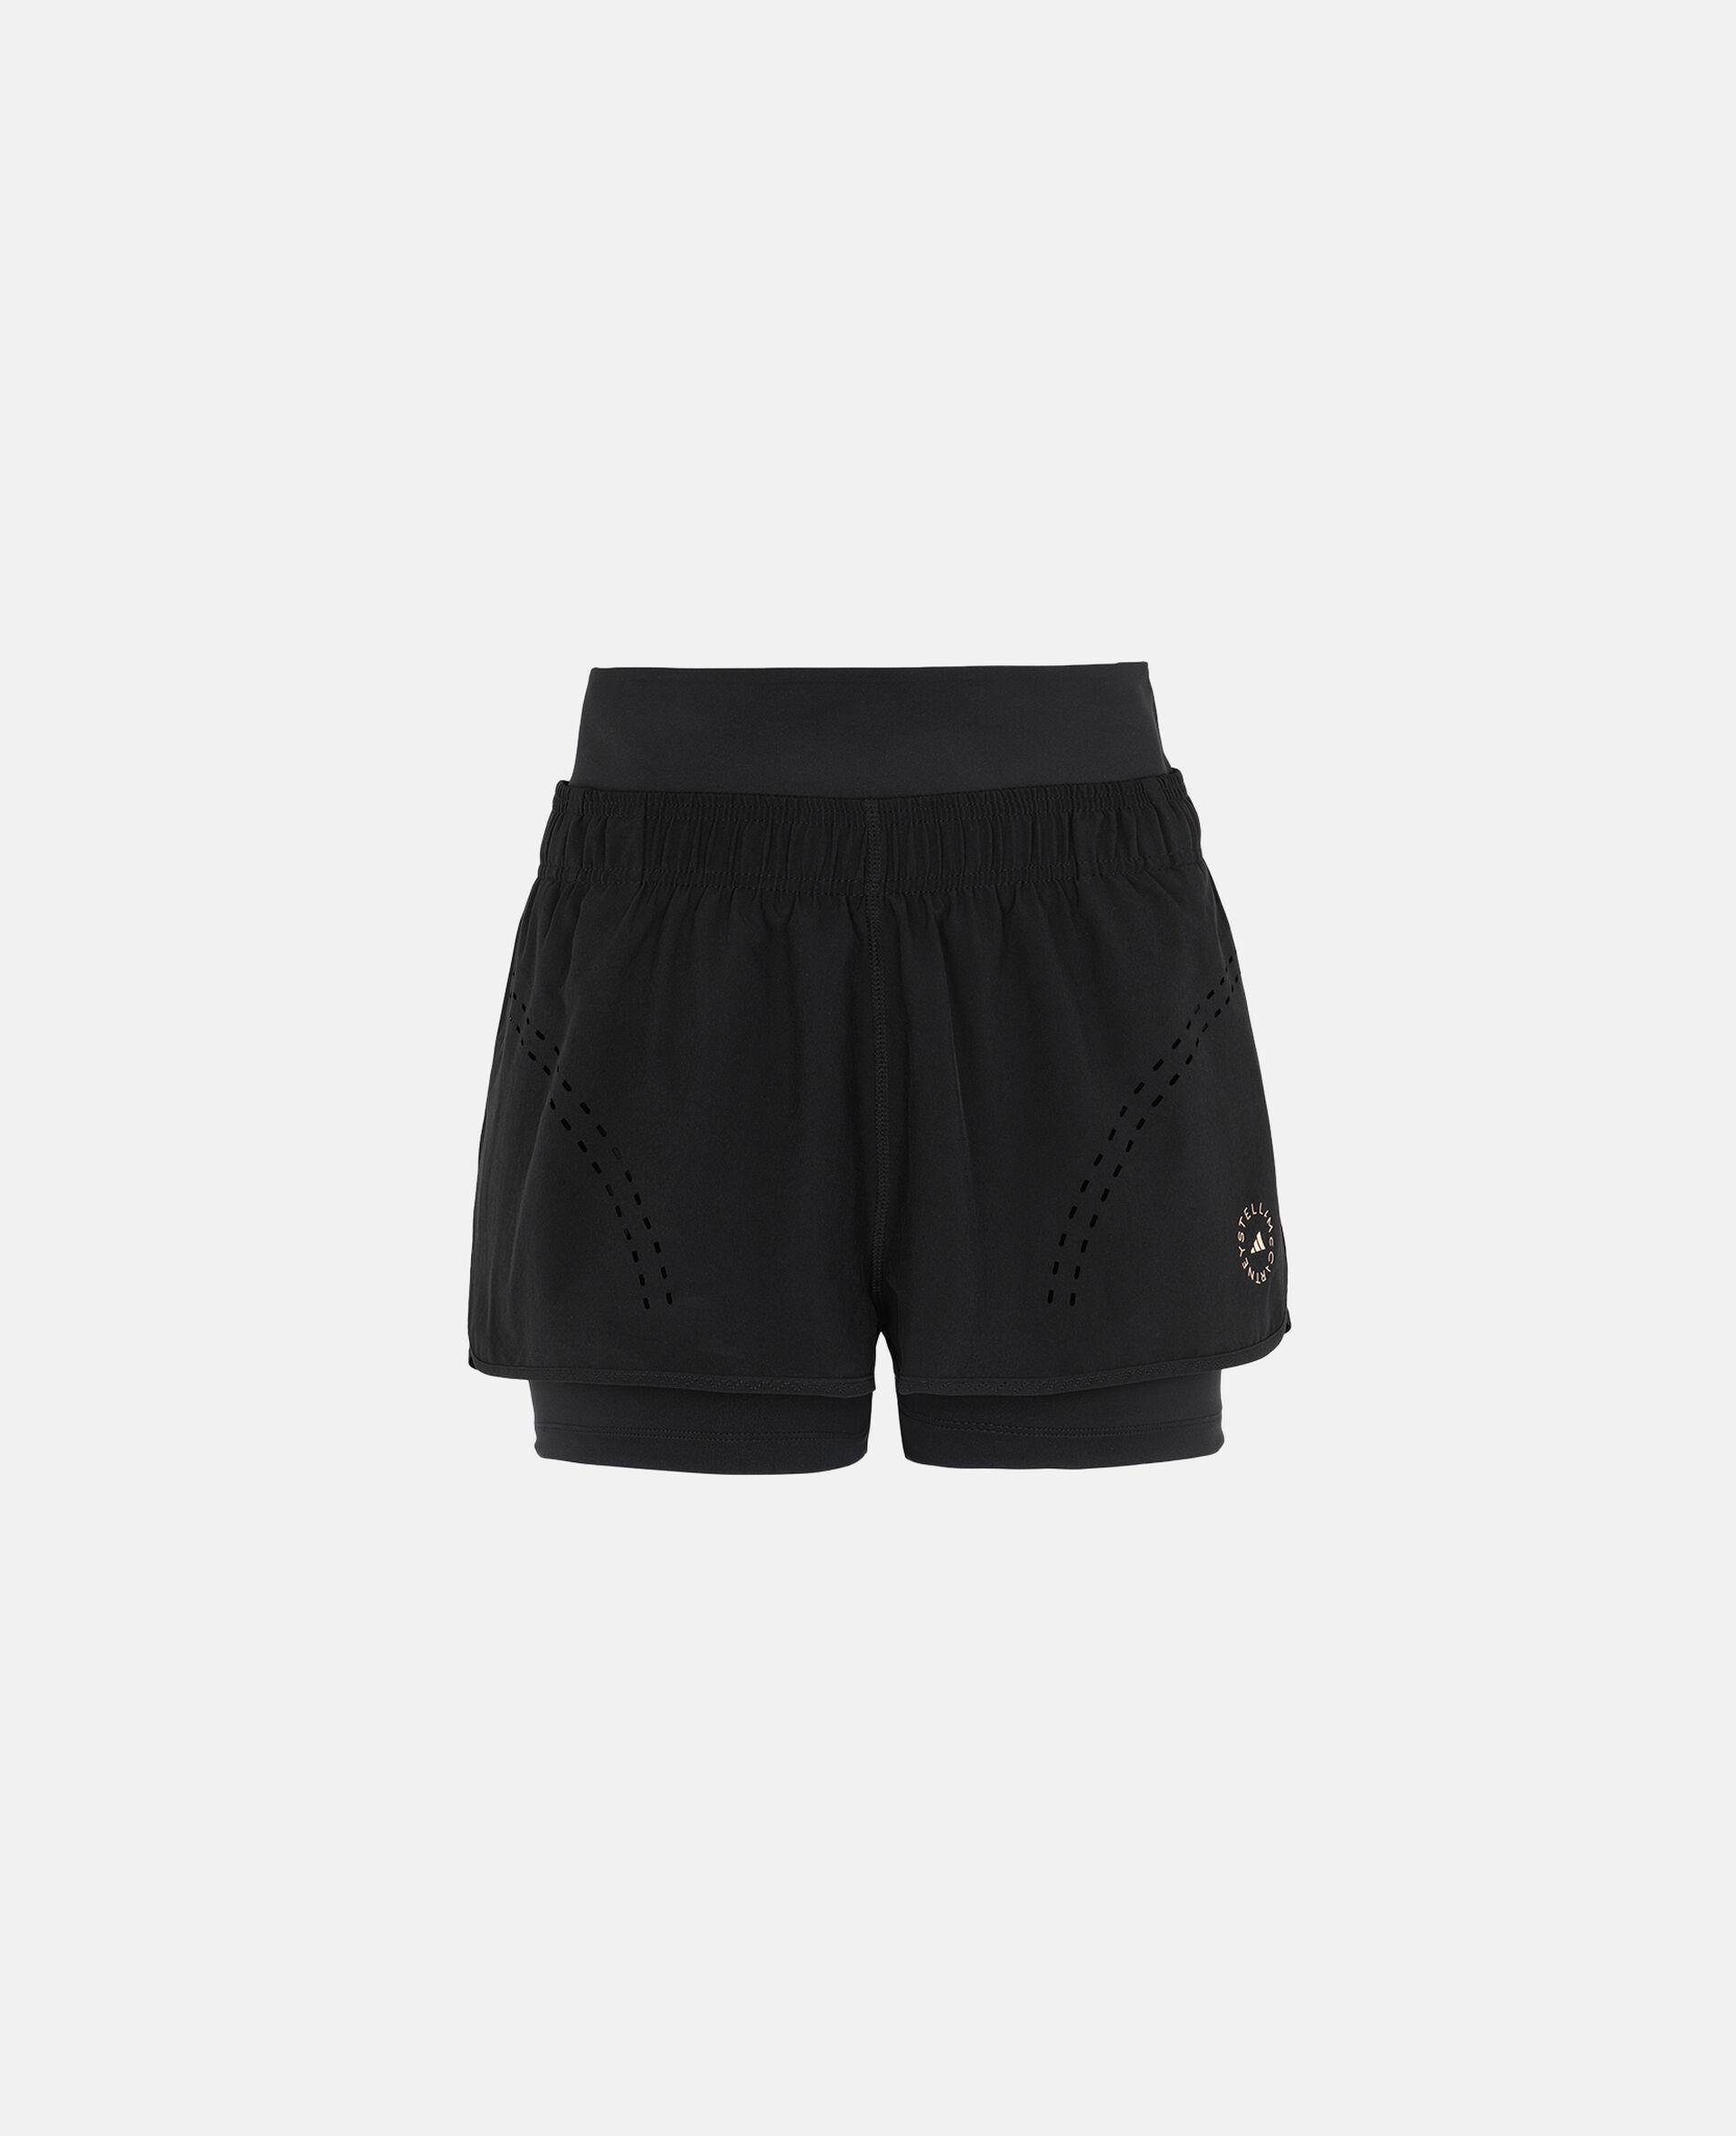 Schwarze TruePurpose Sport-Shorts-Schwarz-large image number 5